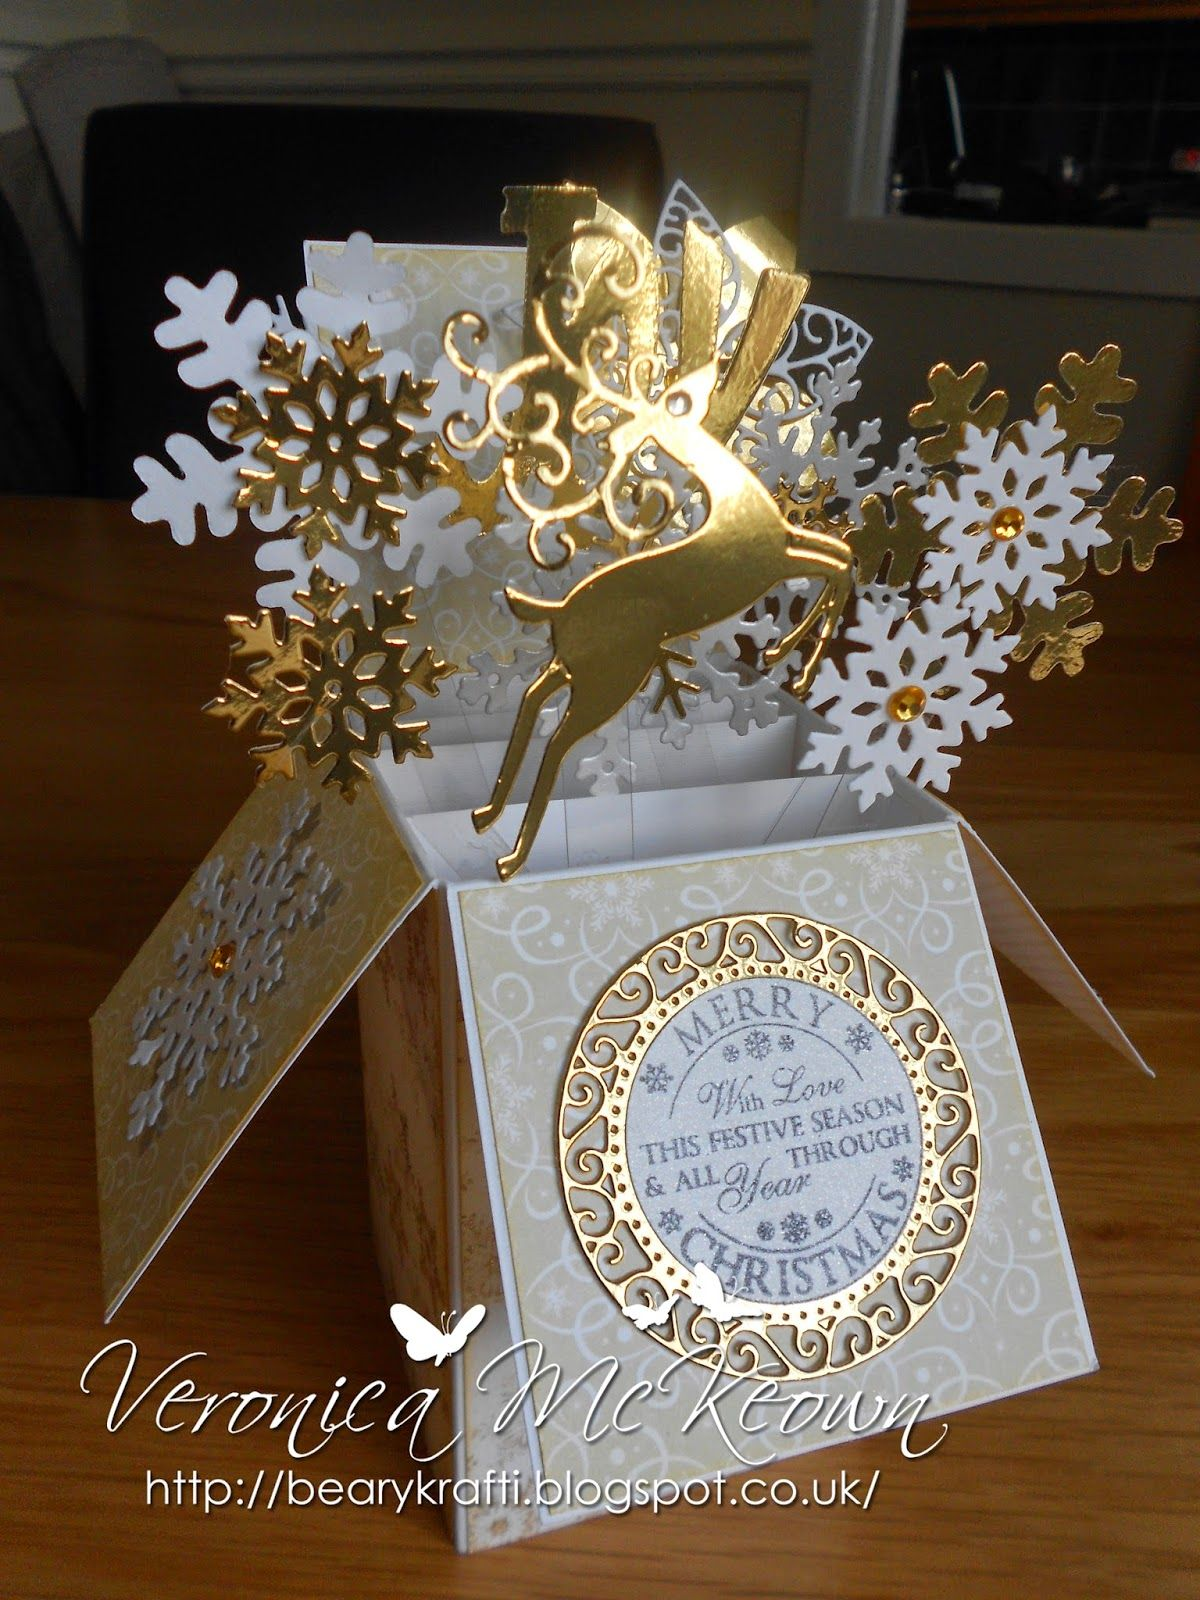 PopUp Box by Veronica McKeown (102114) Card in a Box